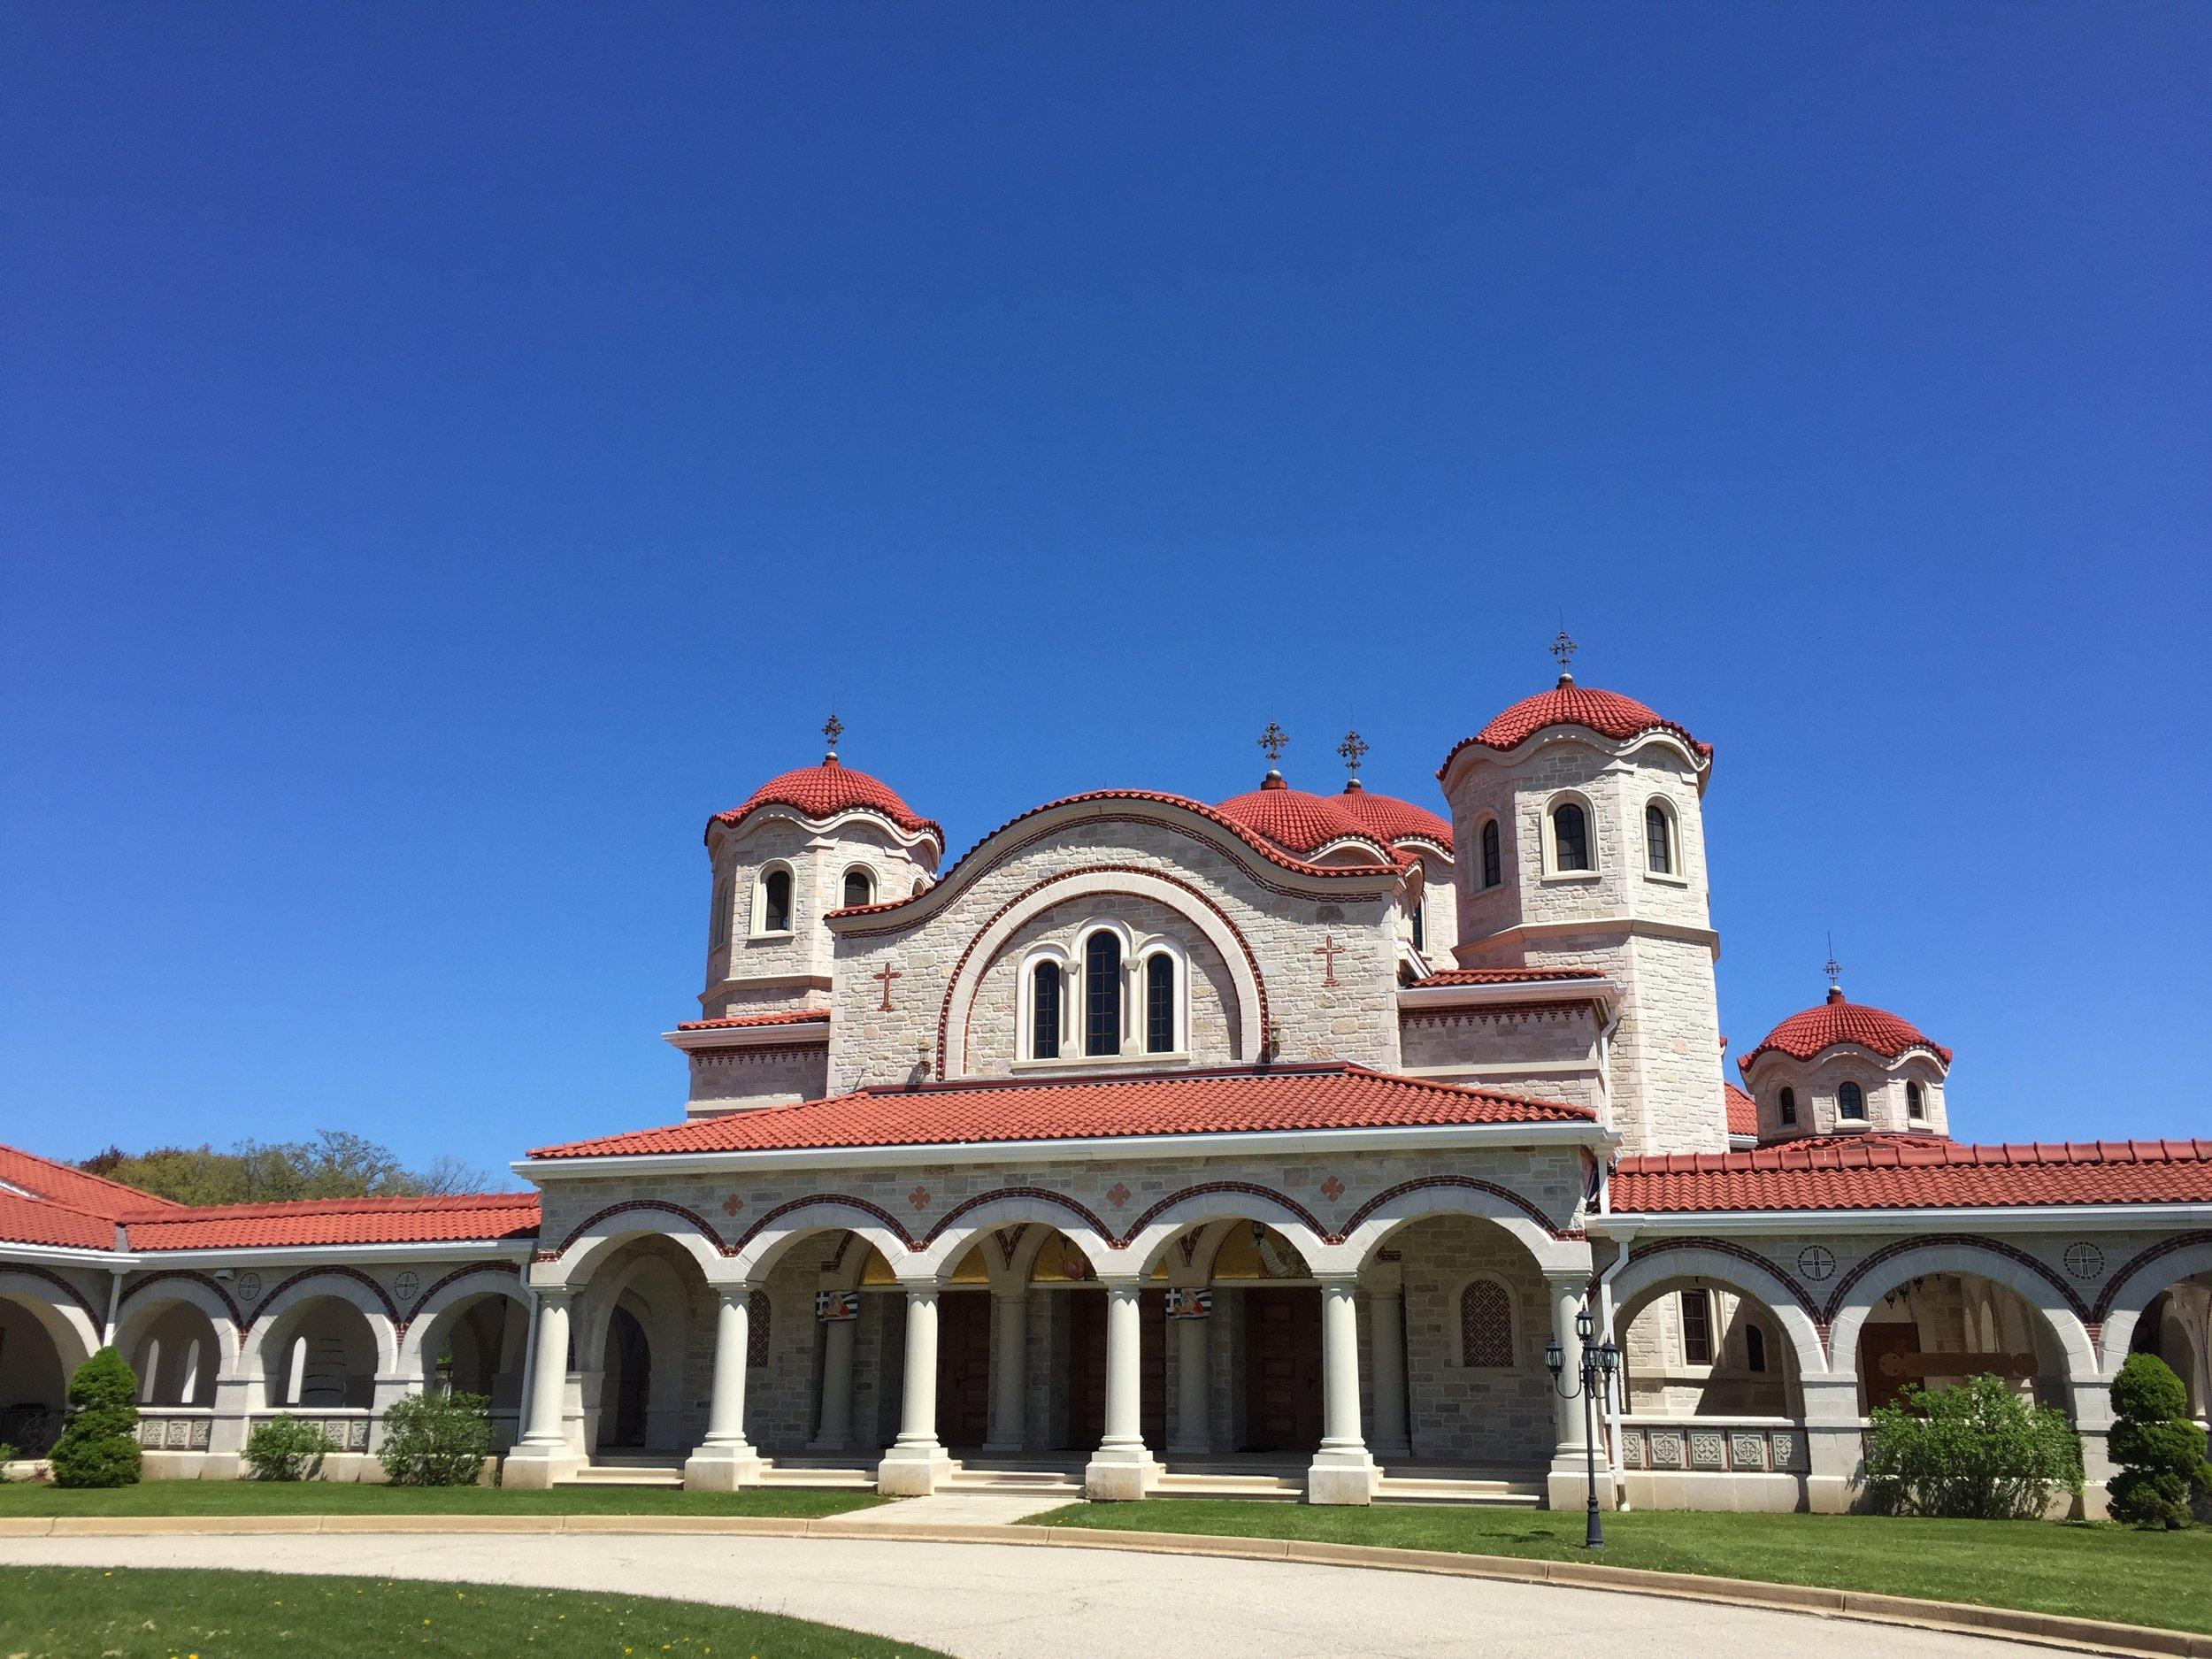 Field Trip to St. John Chrysostomos Greek Orthodox Monastery on May 6th, 2017